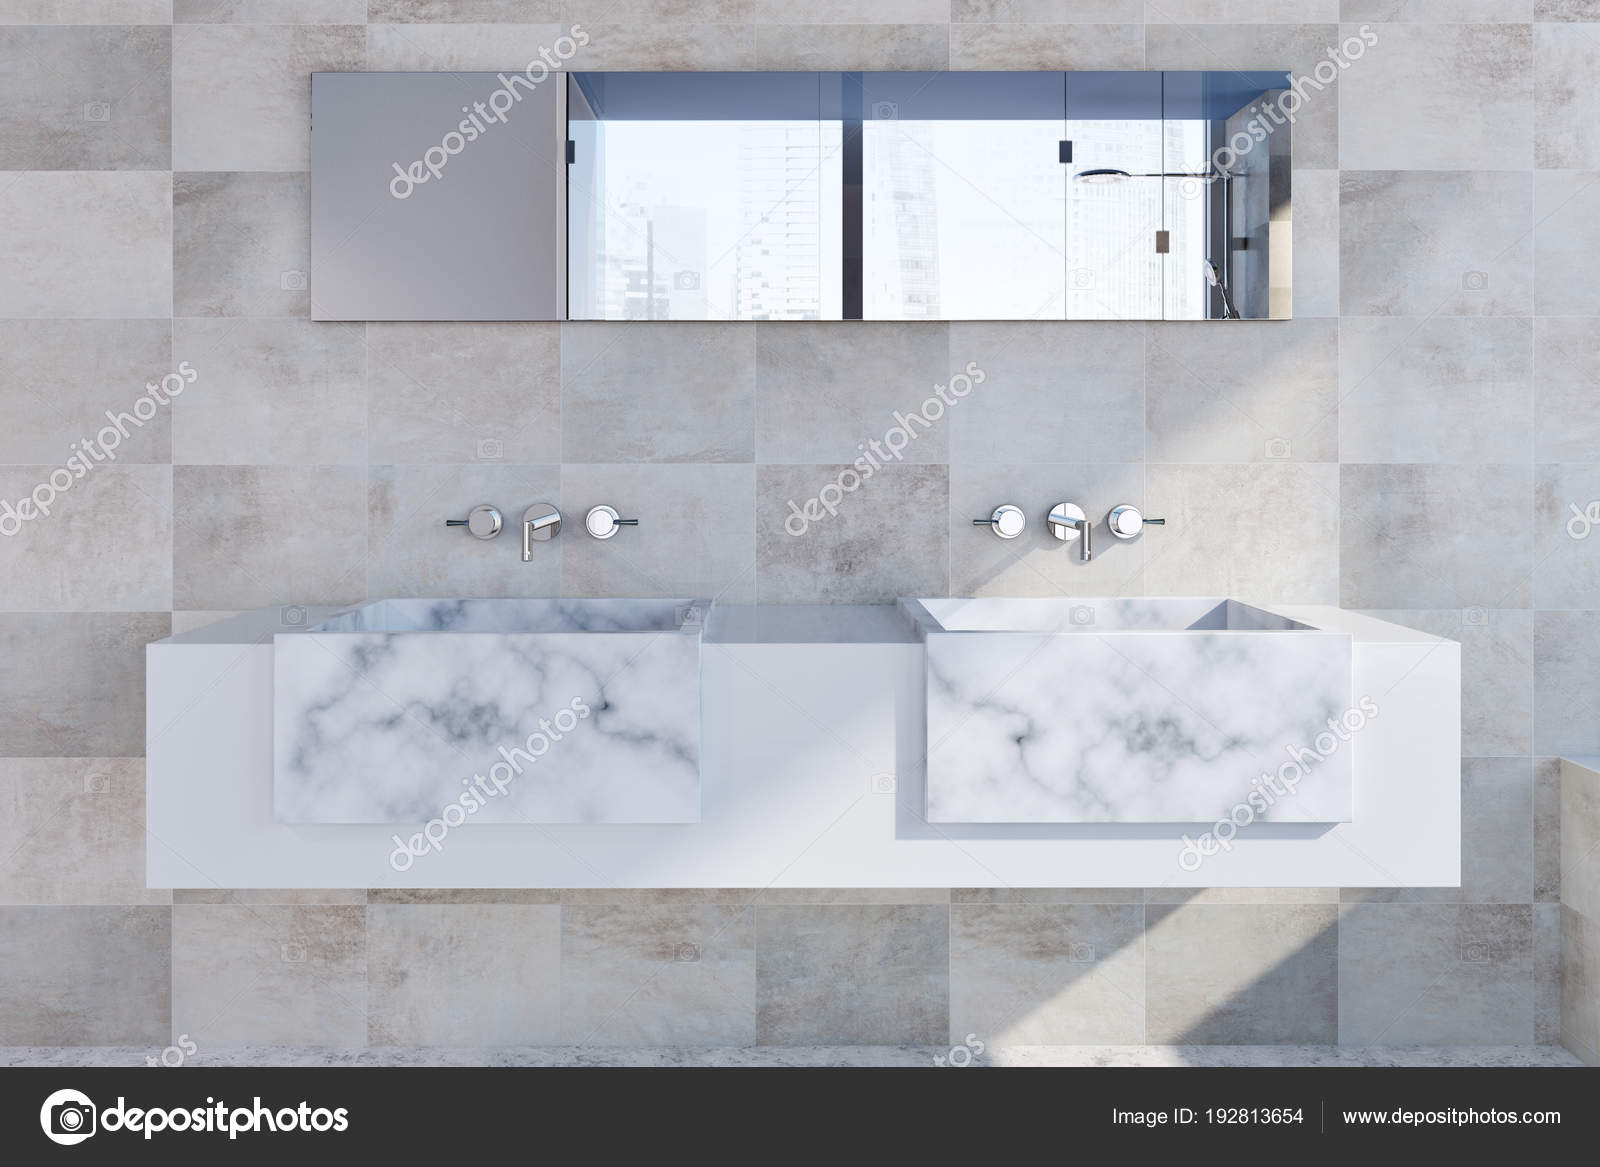 Marmo bianco doppio lavandino bagno u foto stock denisismagilov